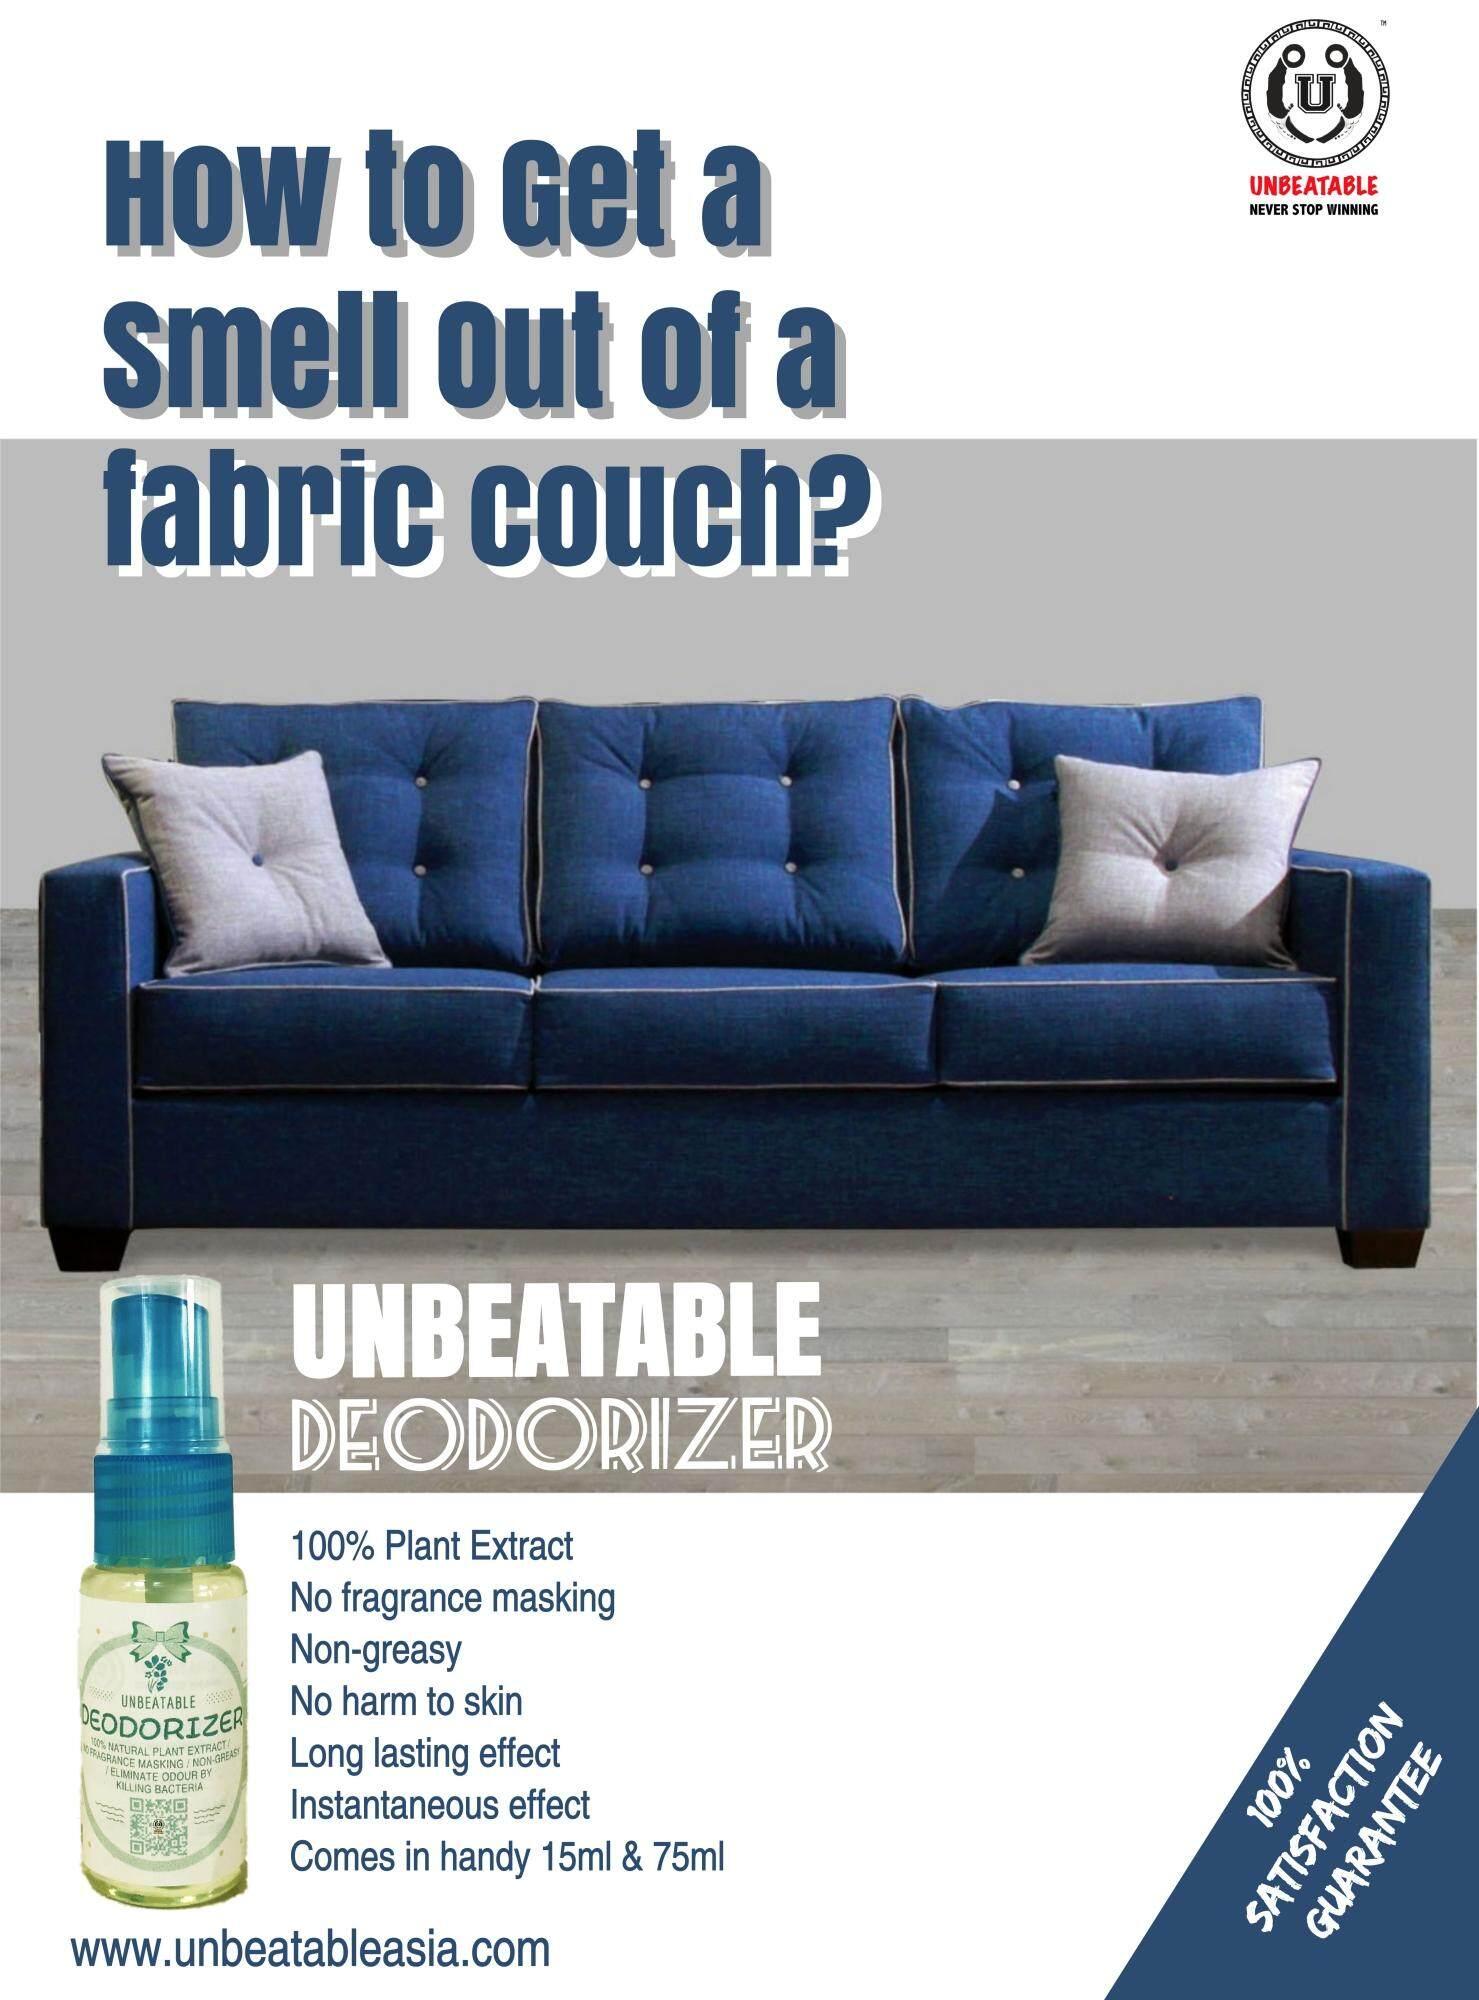 natural sofa deodorizer italian contemporary sofas uk fitur hot selling popular spray deodorant remove bad odor odour 15ml 2